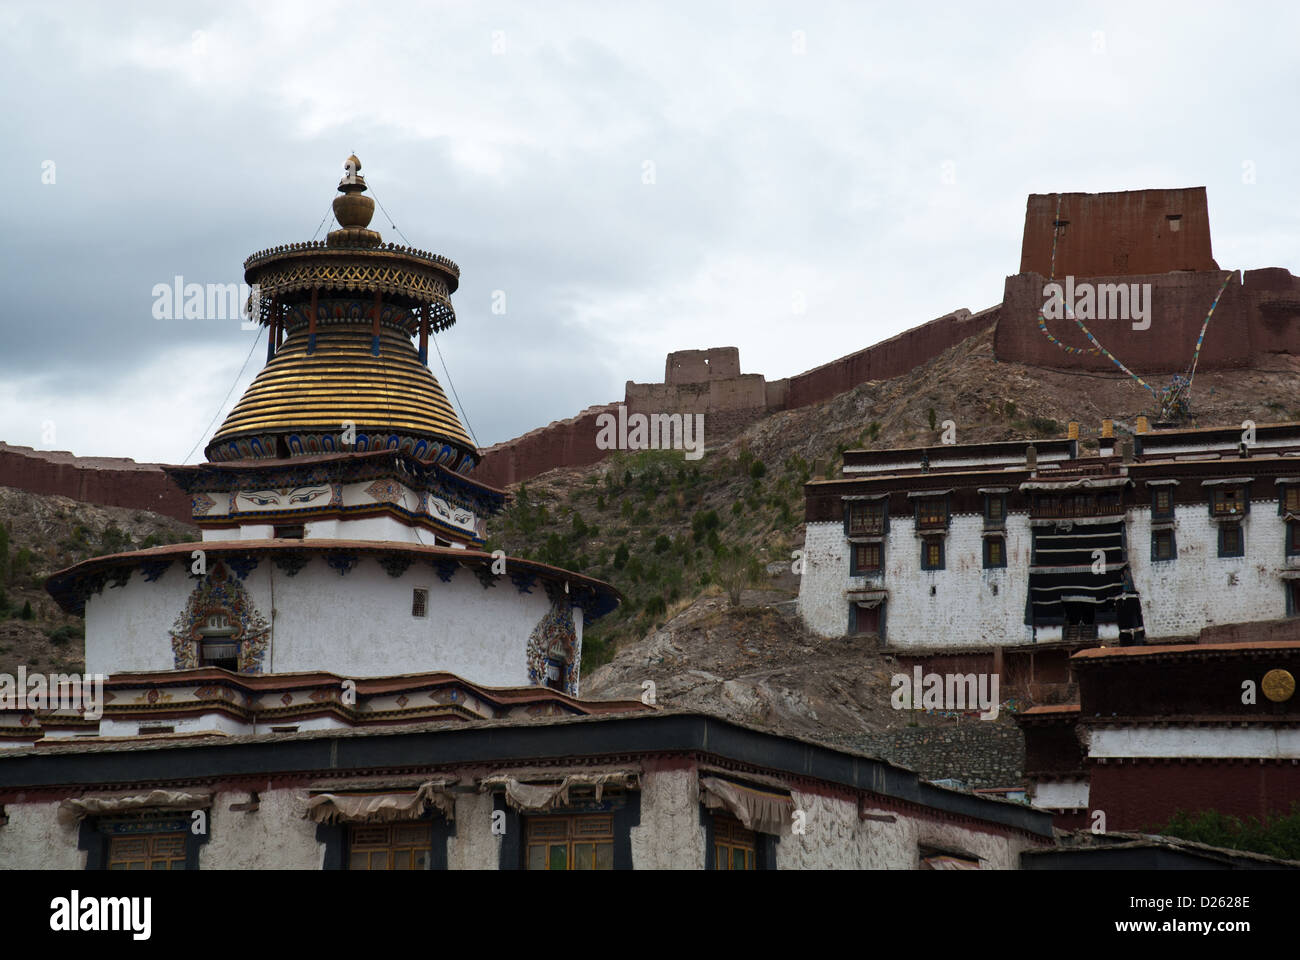 Monastery Pelkor Chöde with Kumbum Chörten and city wall fortress, Tibet, - Stock Image